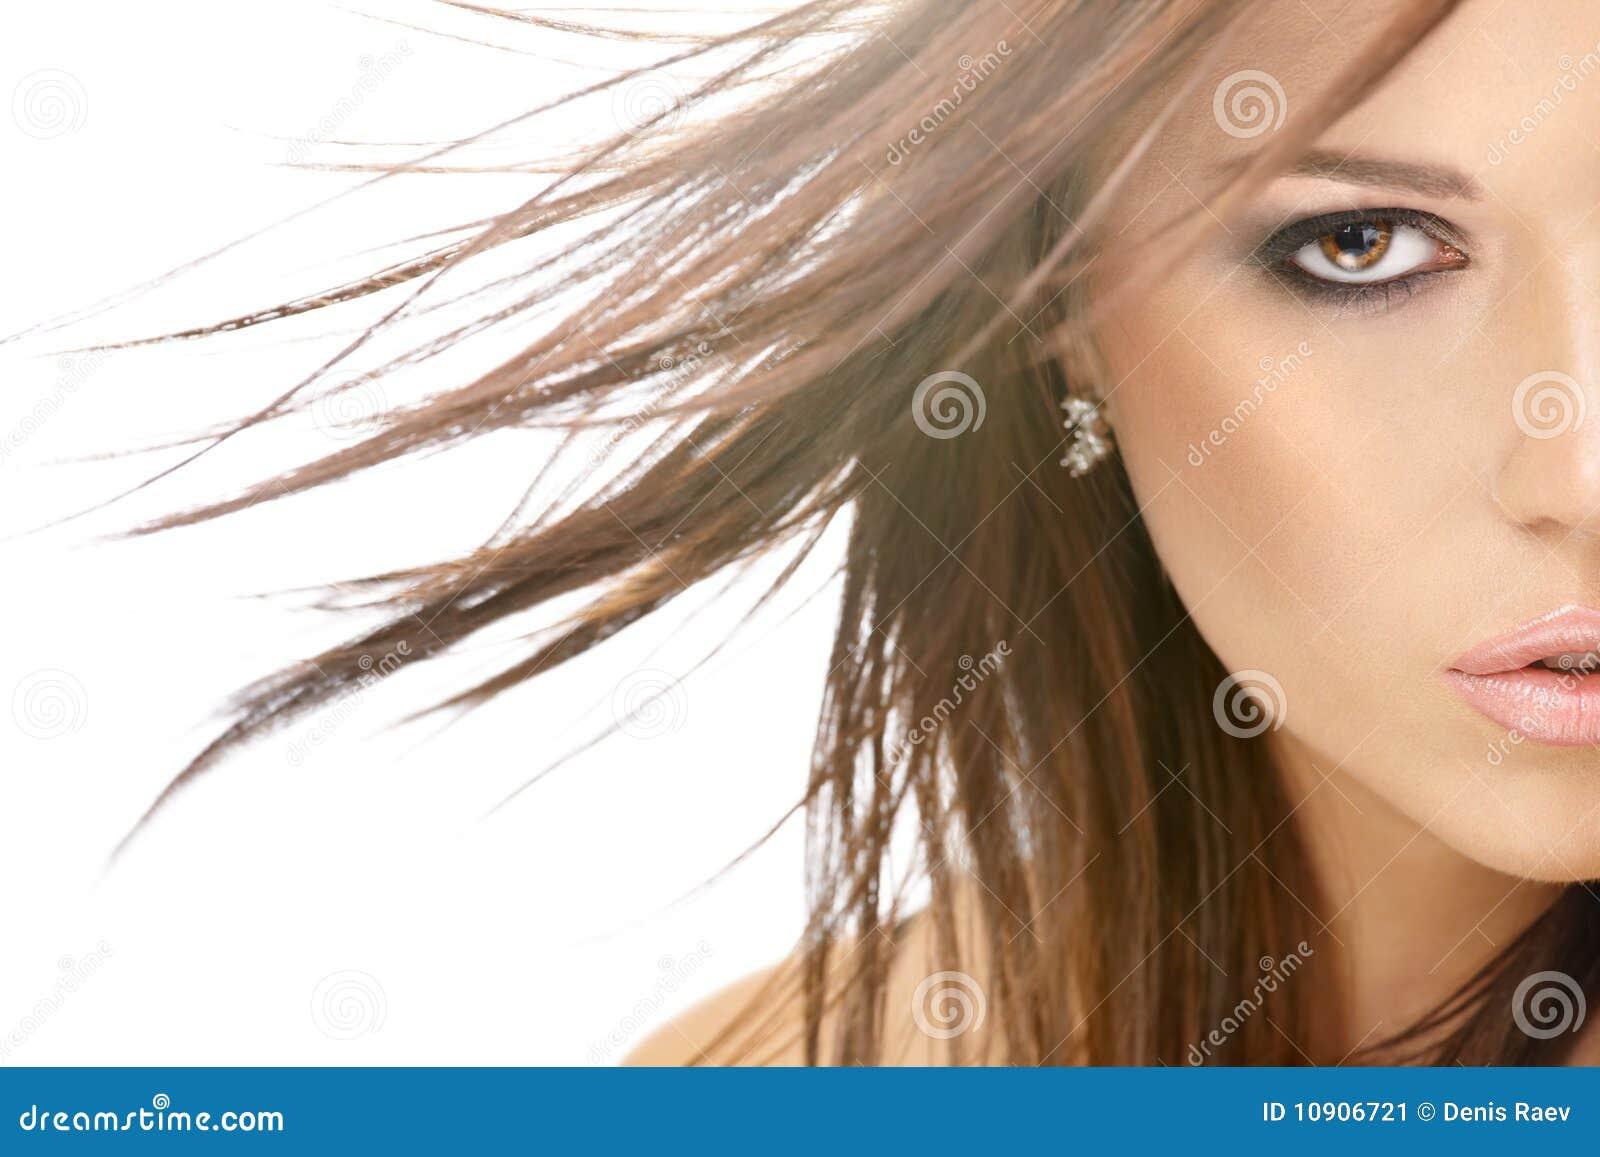 Flying Hair Stock Image Image 10906721